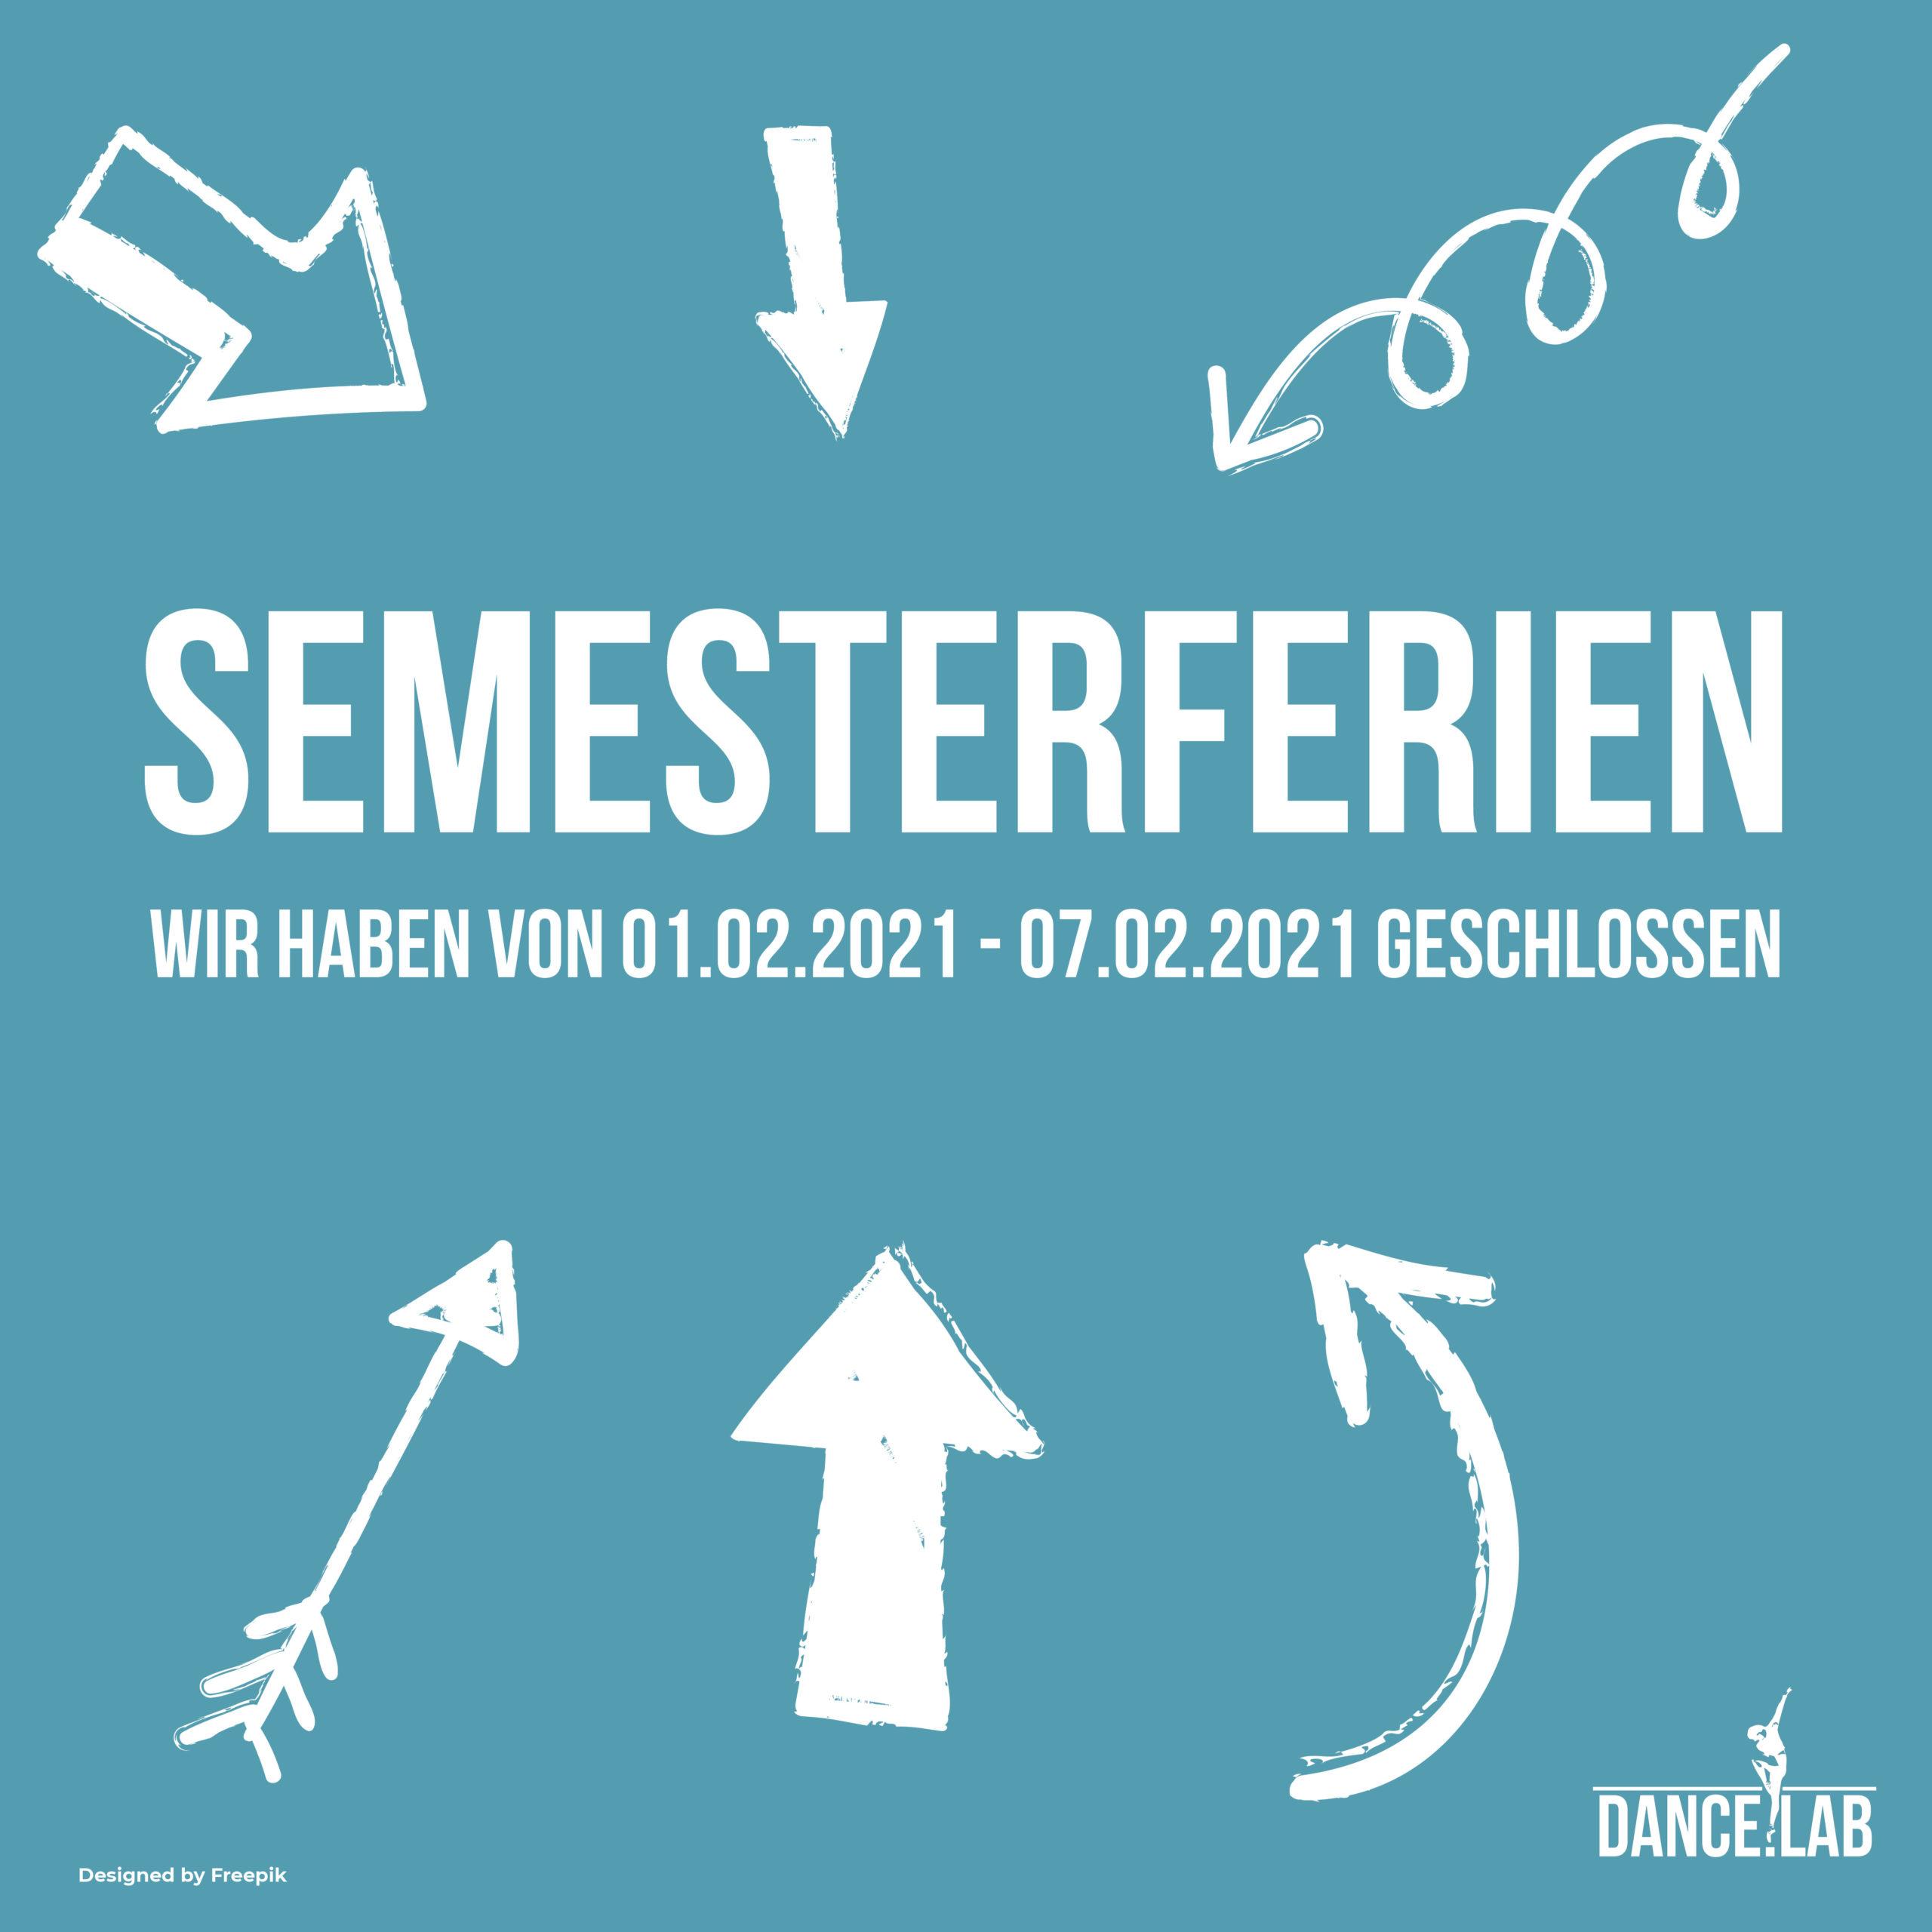 Semesterferien 2021